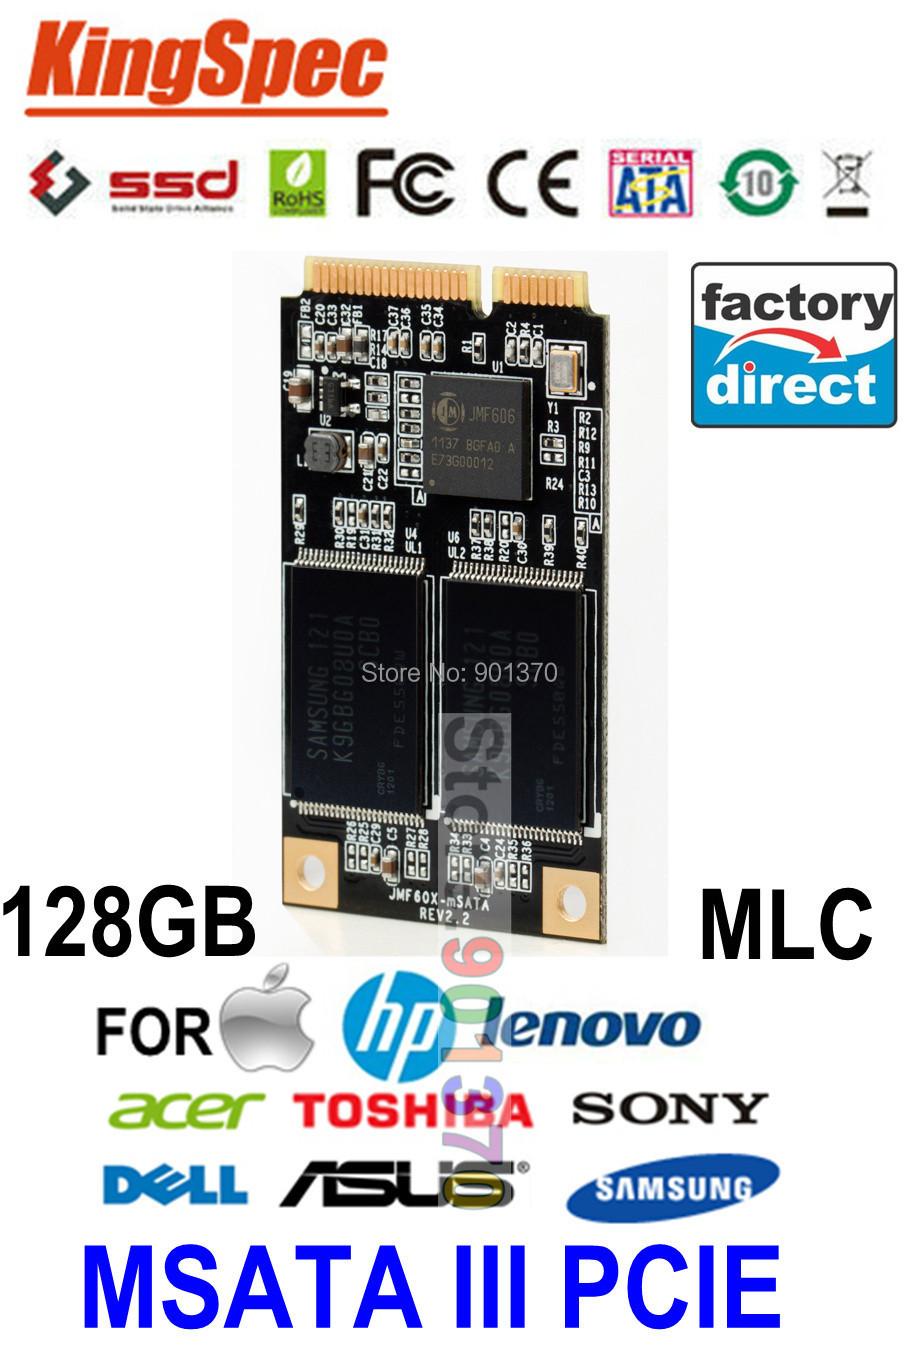 Mini PCIE MSATA 128GB SSD SATA III Solid State Drive Disk 120GB For HP Dell Asus Tablet PC For Lenovo V370 V470 Y470 K26 K27(China (Mainland))